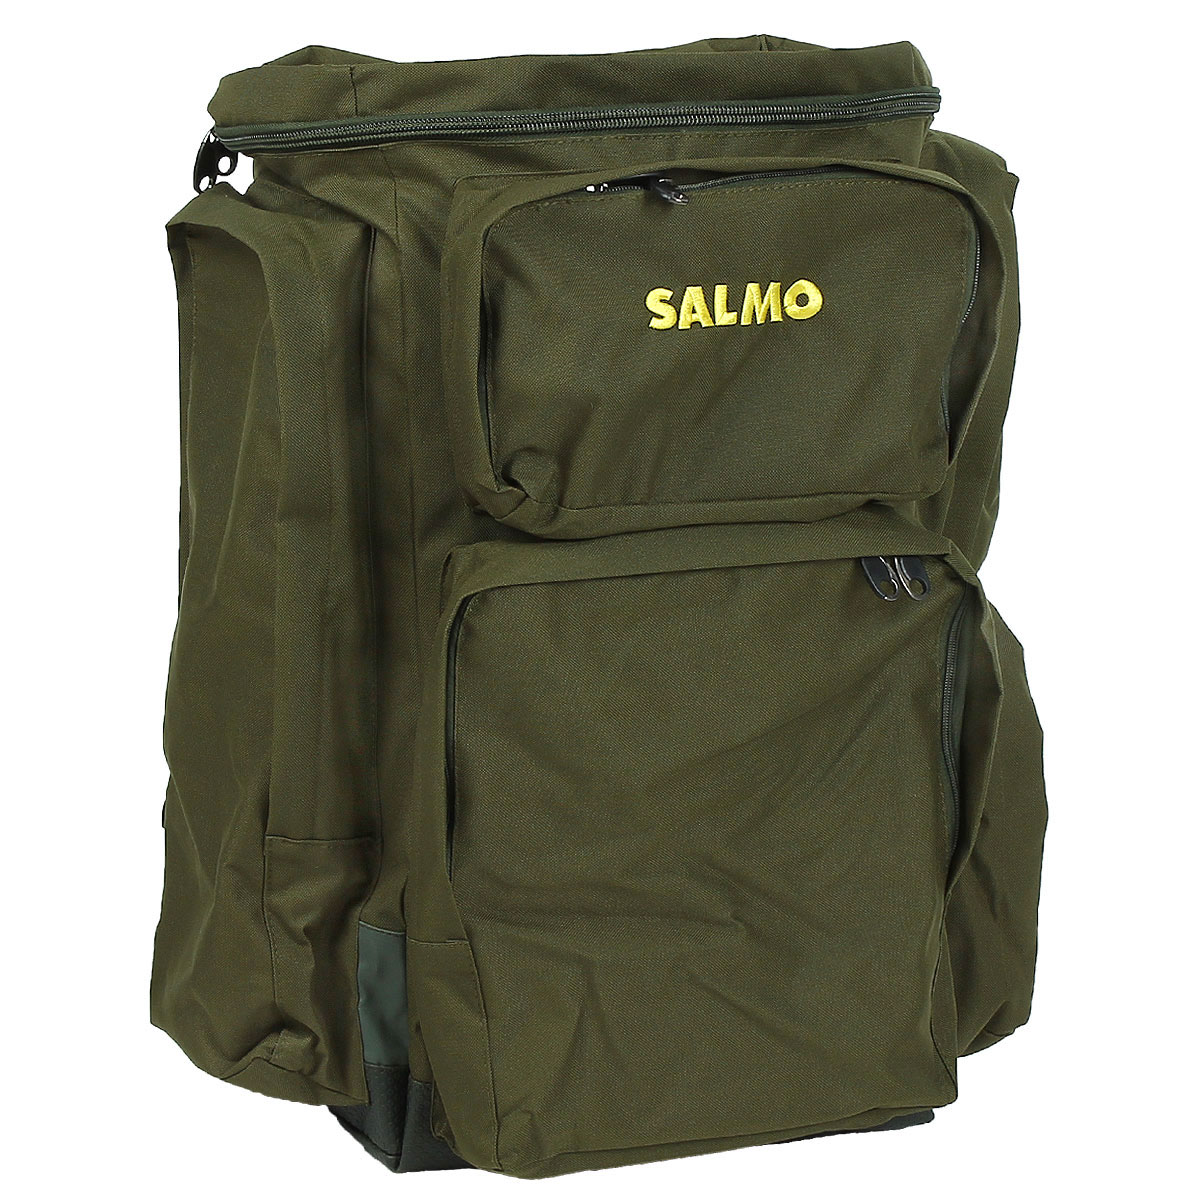 Рюкзак рыболовный Salmo 105 л, цвет: зеленый рюкзак рыболовный salmo 105л